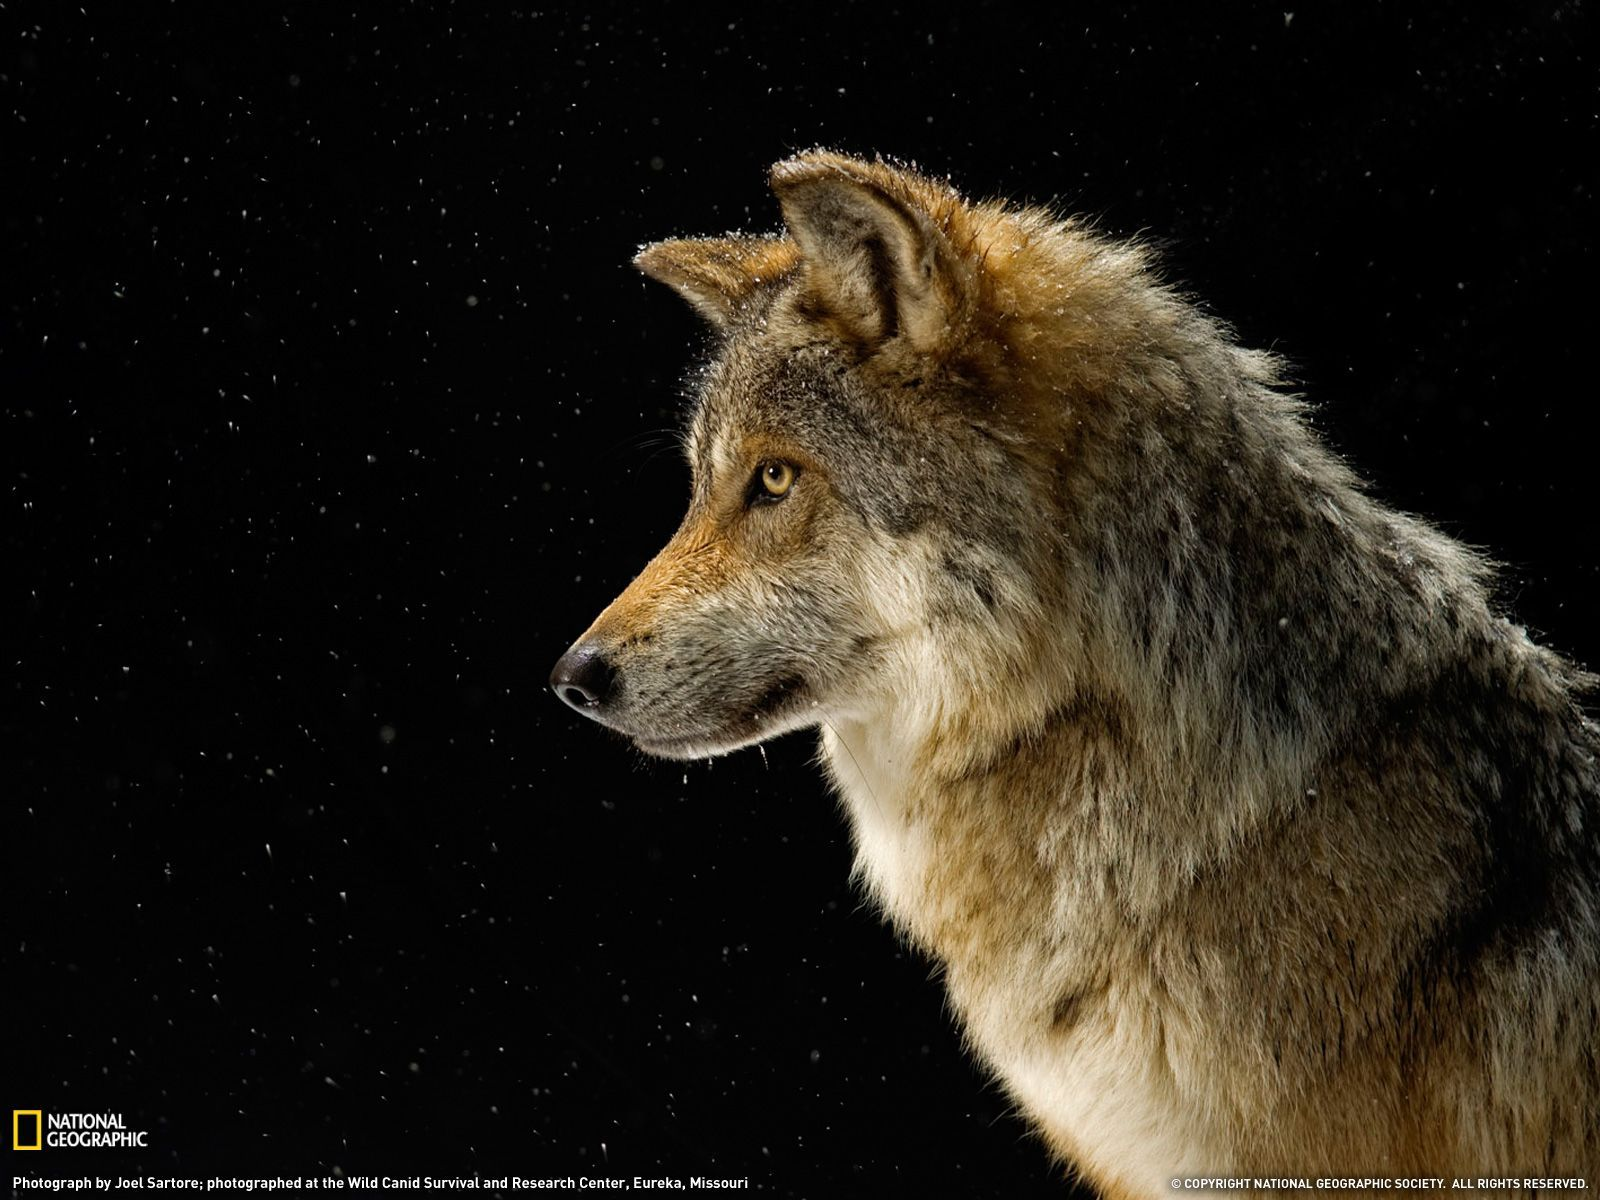 Wonderful Gray Wolf Wallpaper National Geographic - ed59f68eccd2f3c172fc26d2b239c49d  Graphic_707155.jpg